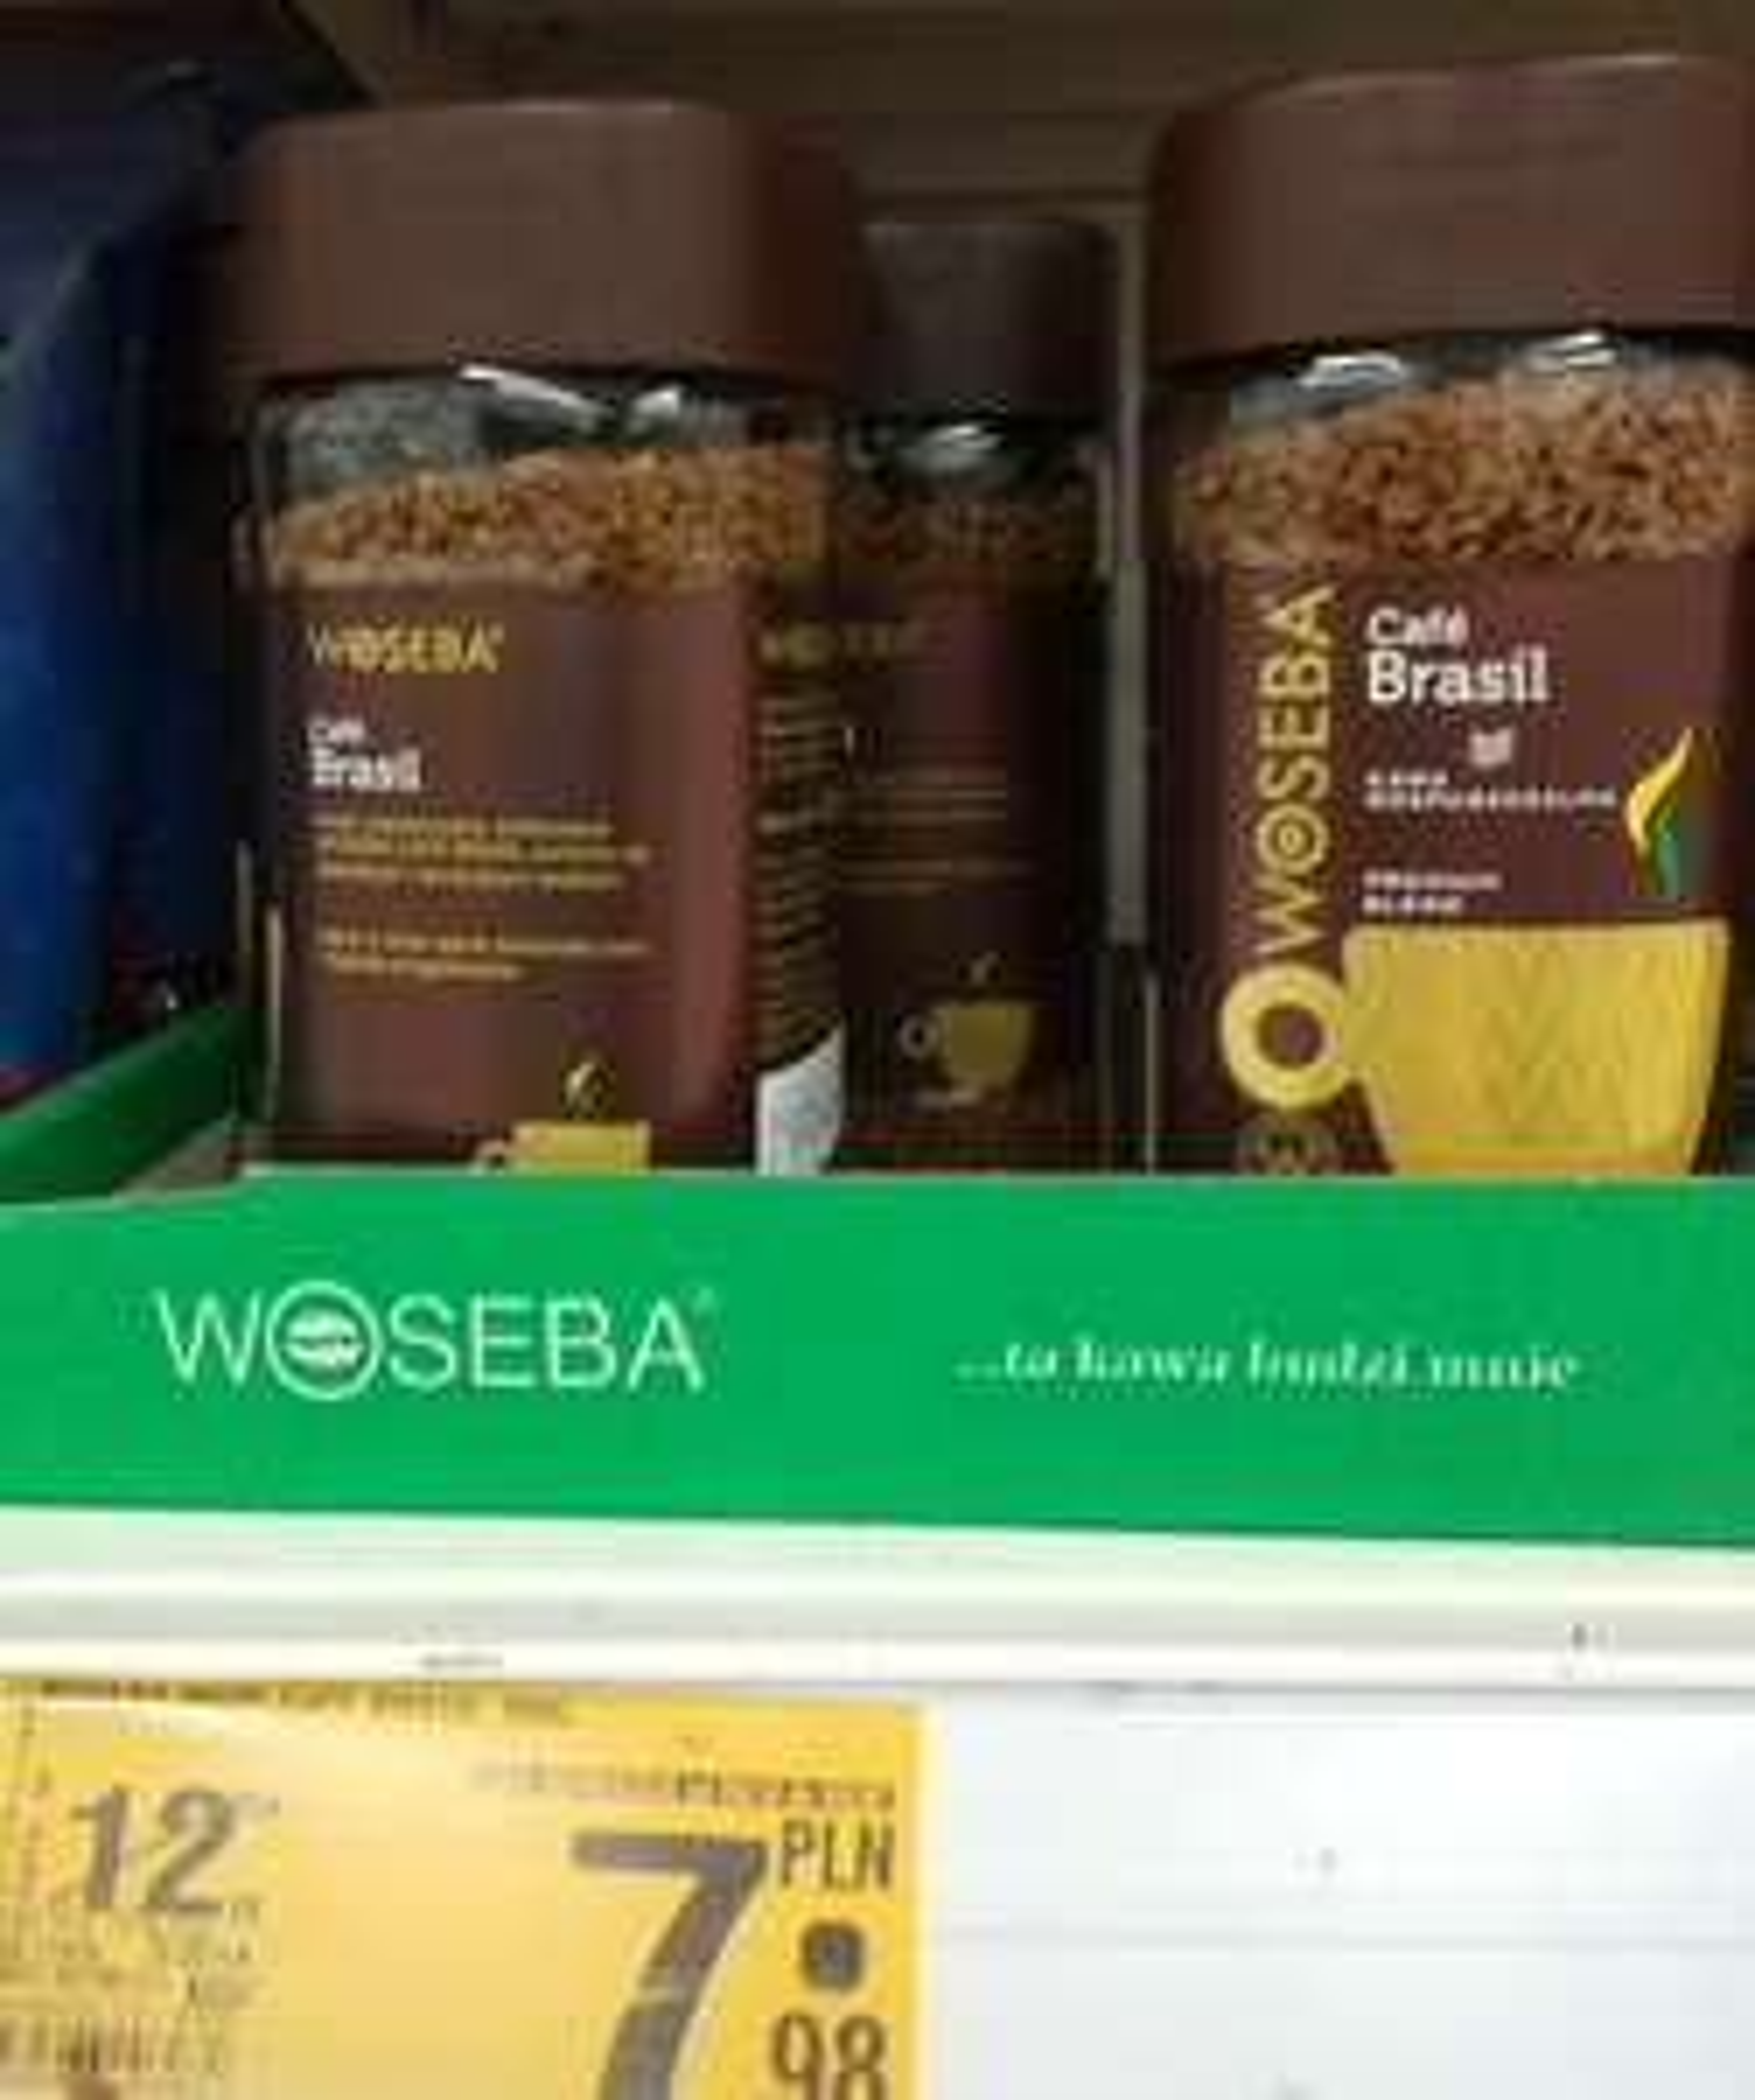 Kawa Cafe Brasil Woseba Auchan